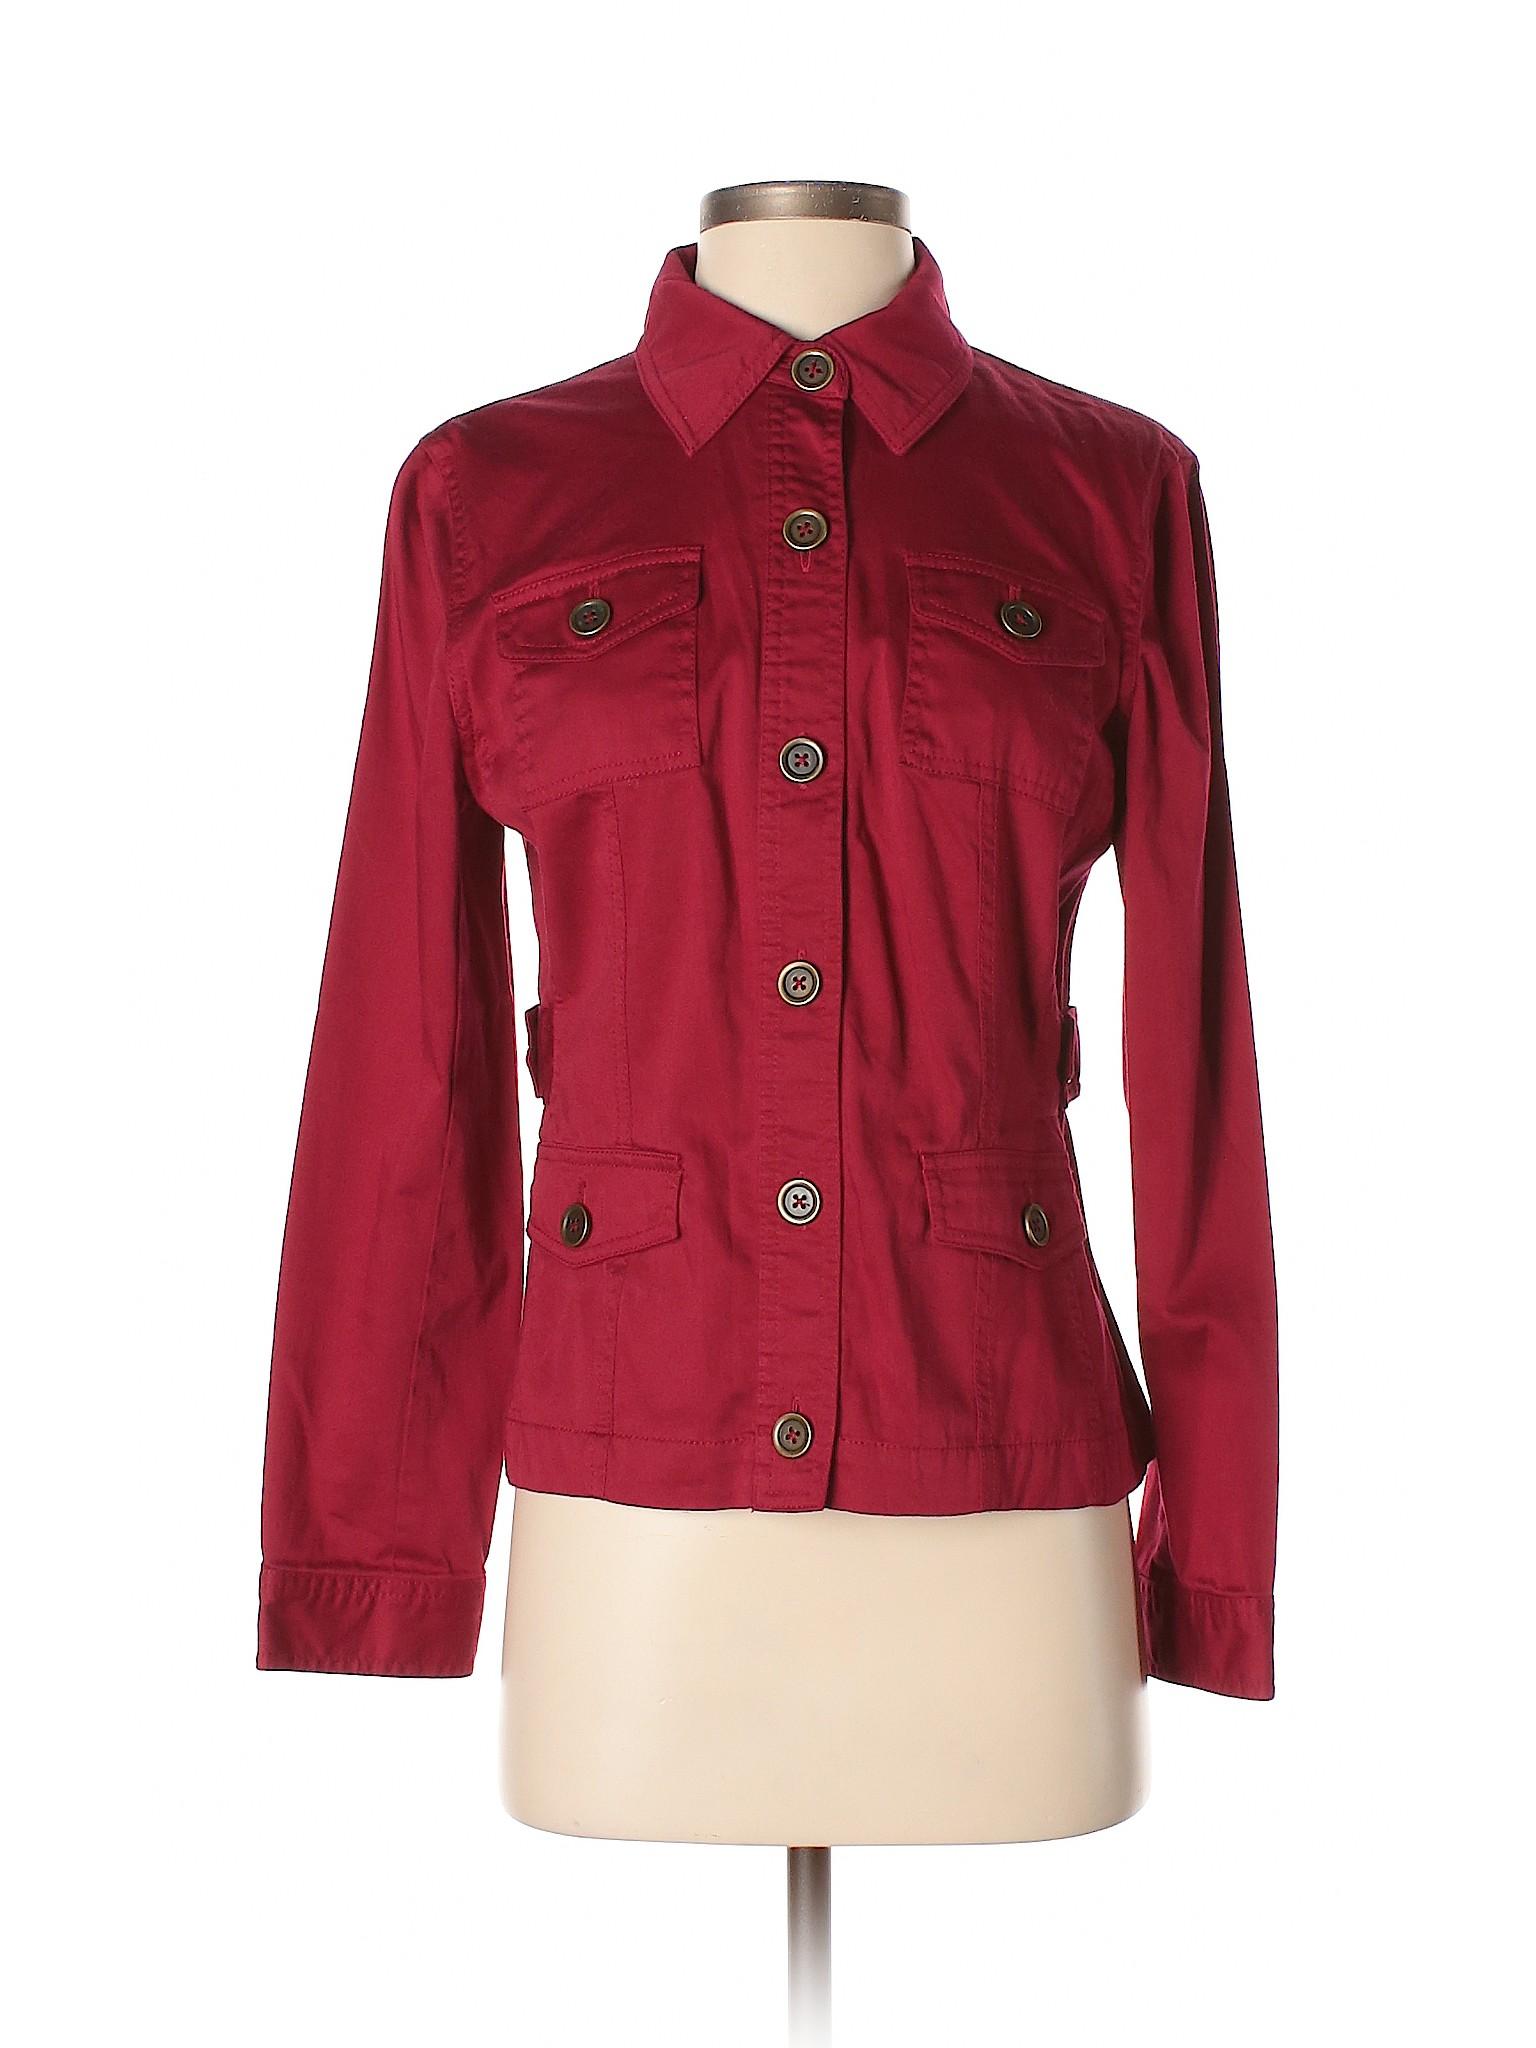 Boutique Jacket New Jones York leisure x7F7qwSr